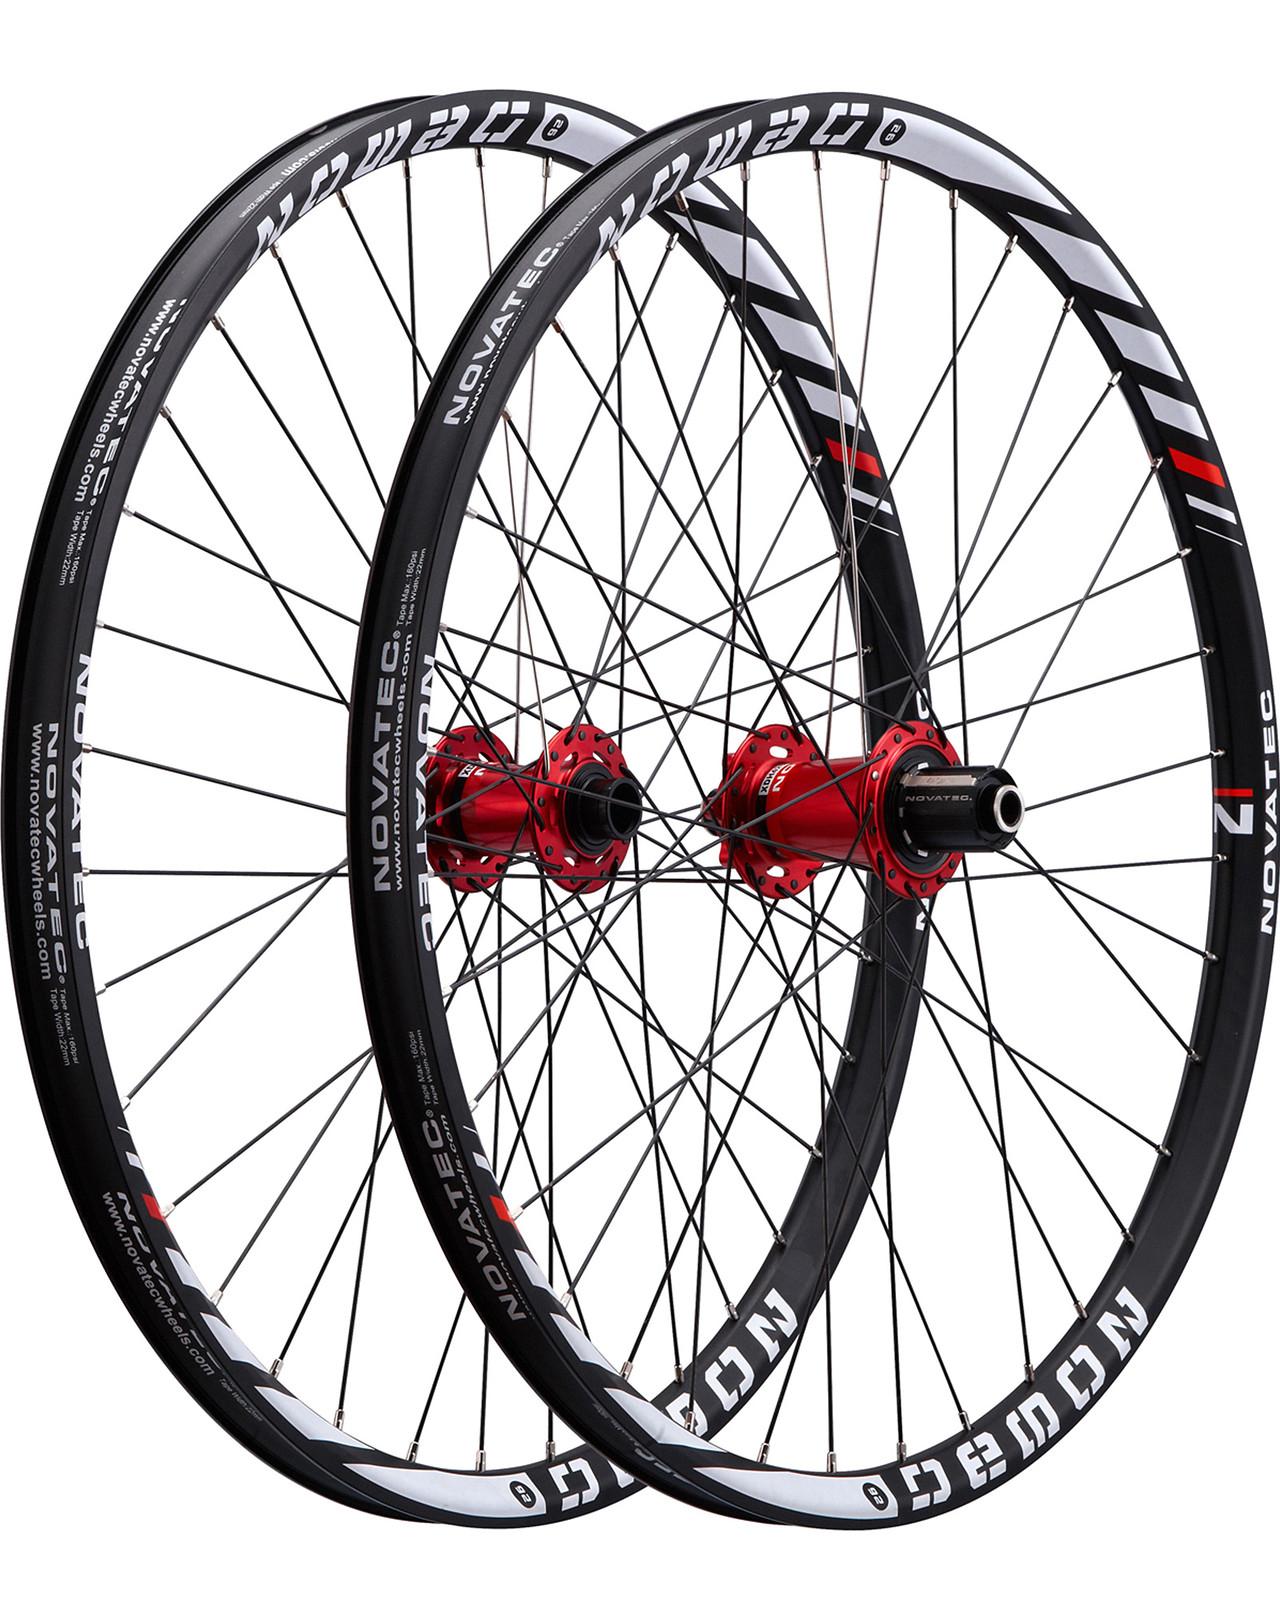 Novatec Demon Complete Wheelset demon